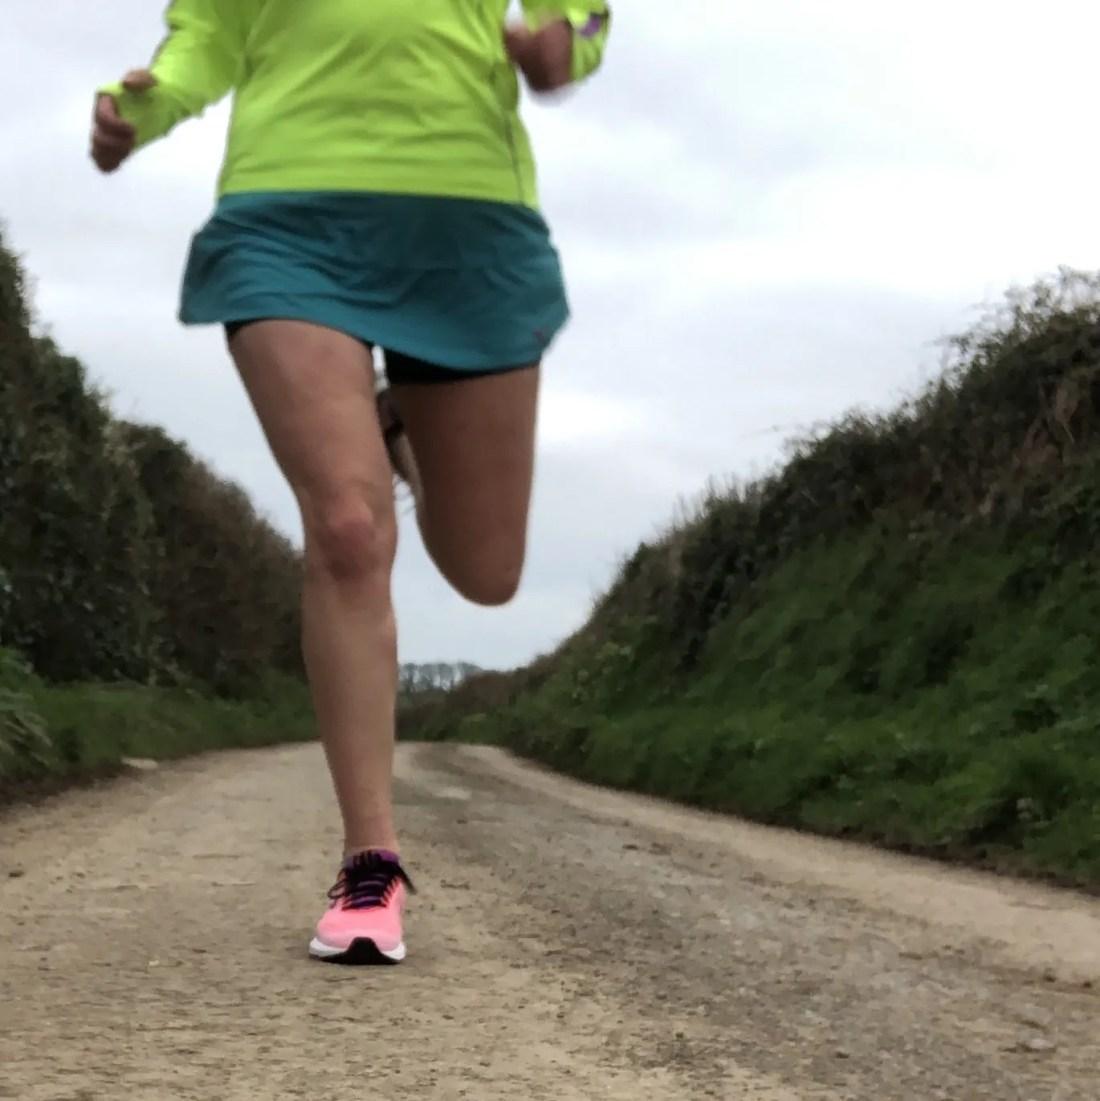 Lady running legs